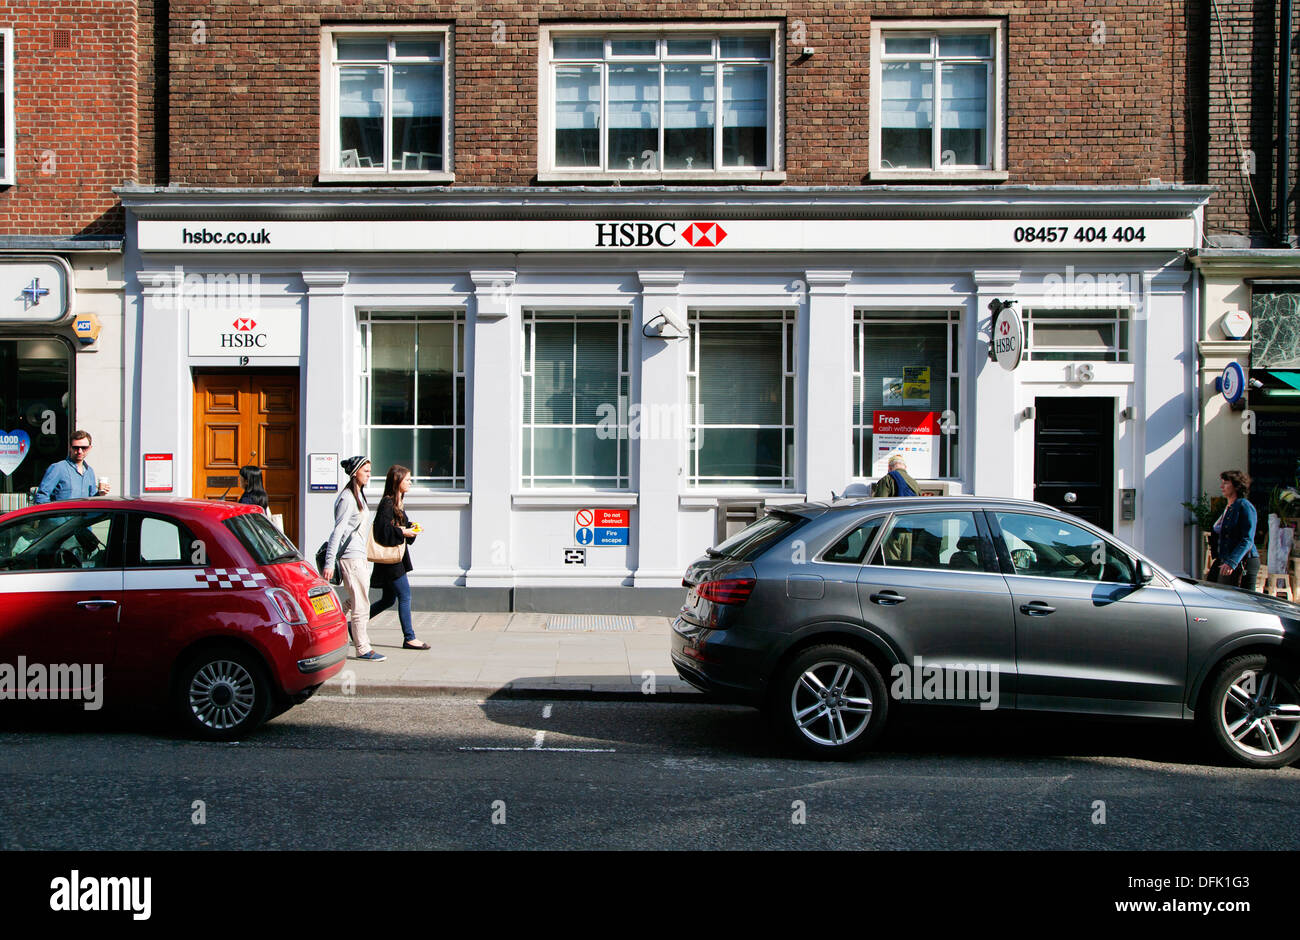 HSBC Bank, Marylebone High Street, London, England, UK